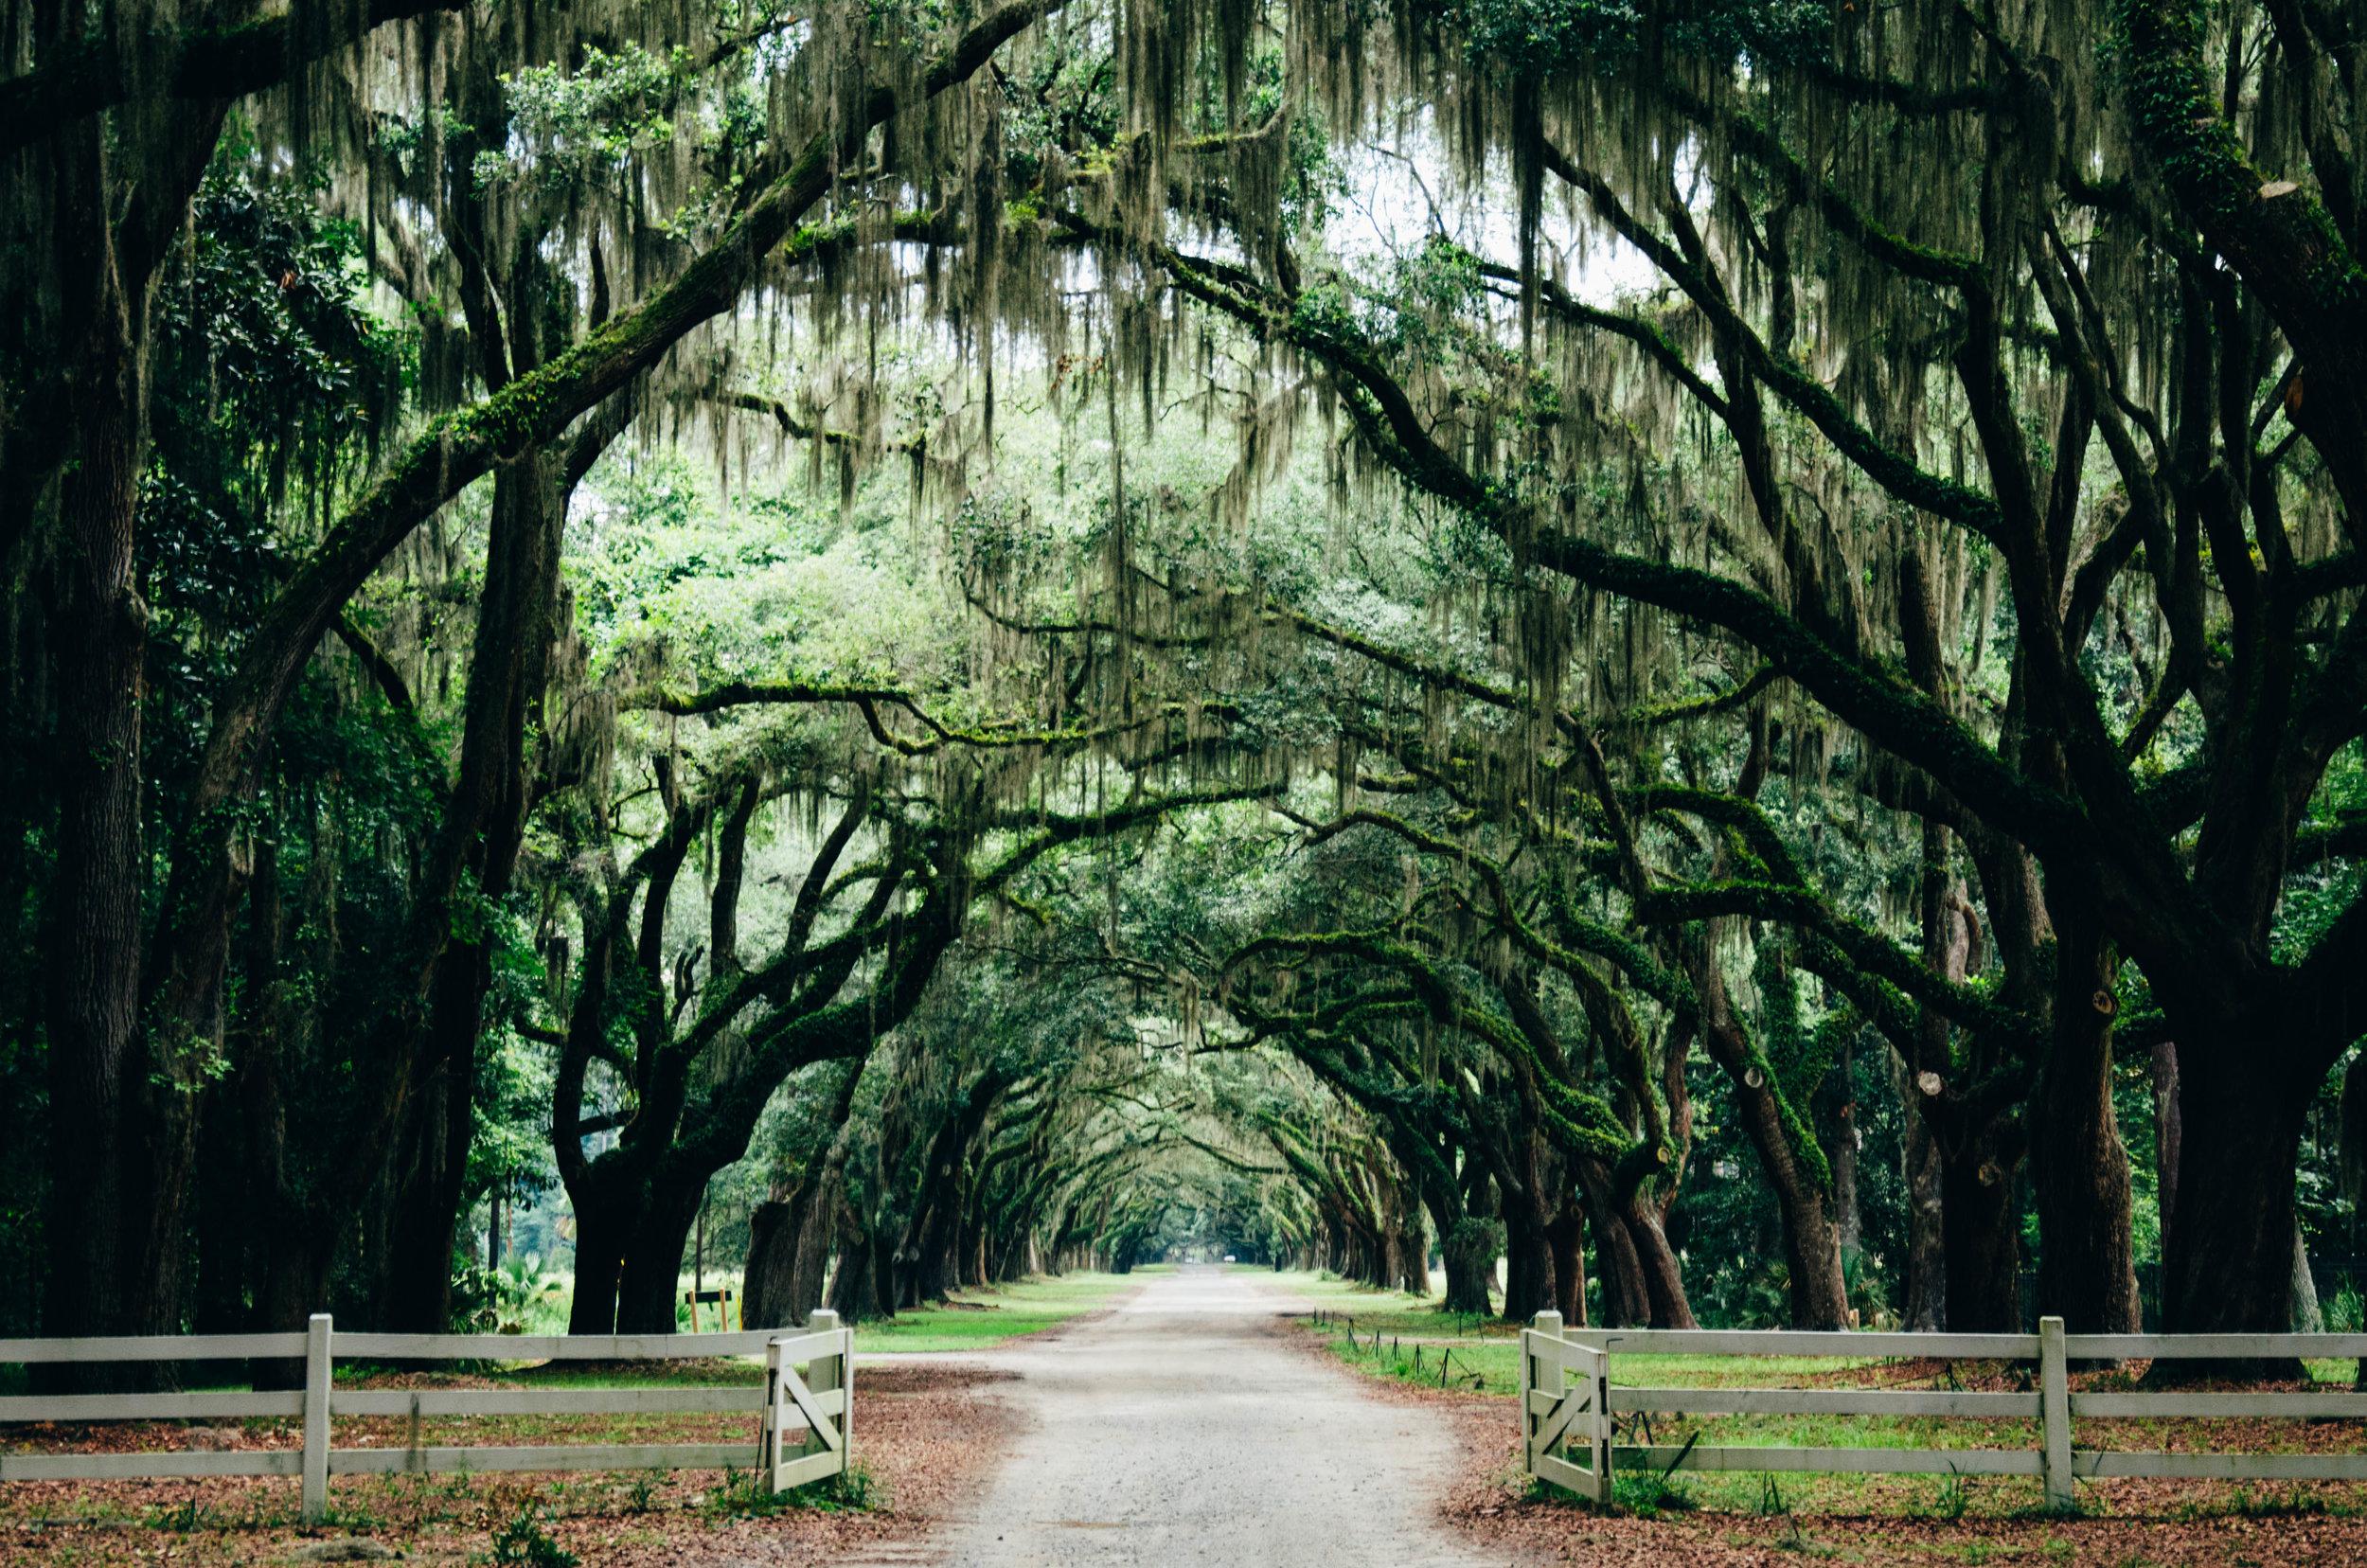 south-atlanta - States Represented: Alabama, Arkansas, Florida, Georgia, Louisiana, Mississippi, North Carolina, South Carolina, Tennessee, Commonwealth of Puerto Rico